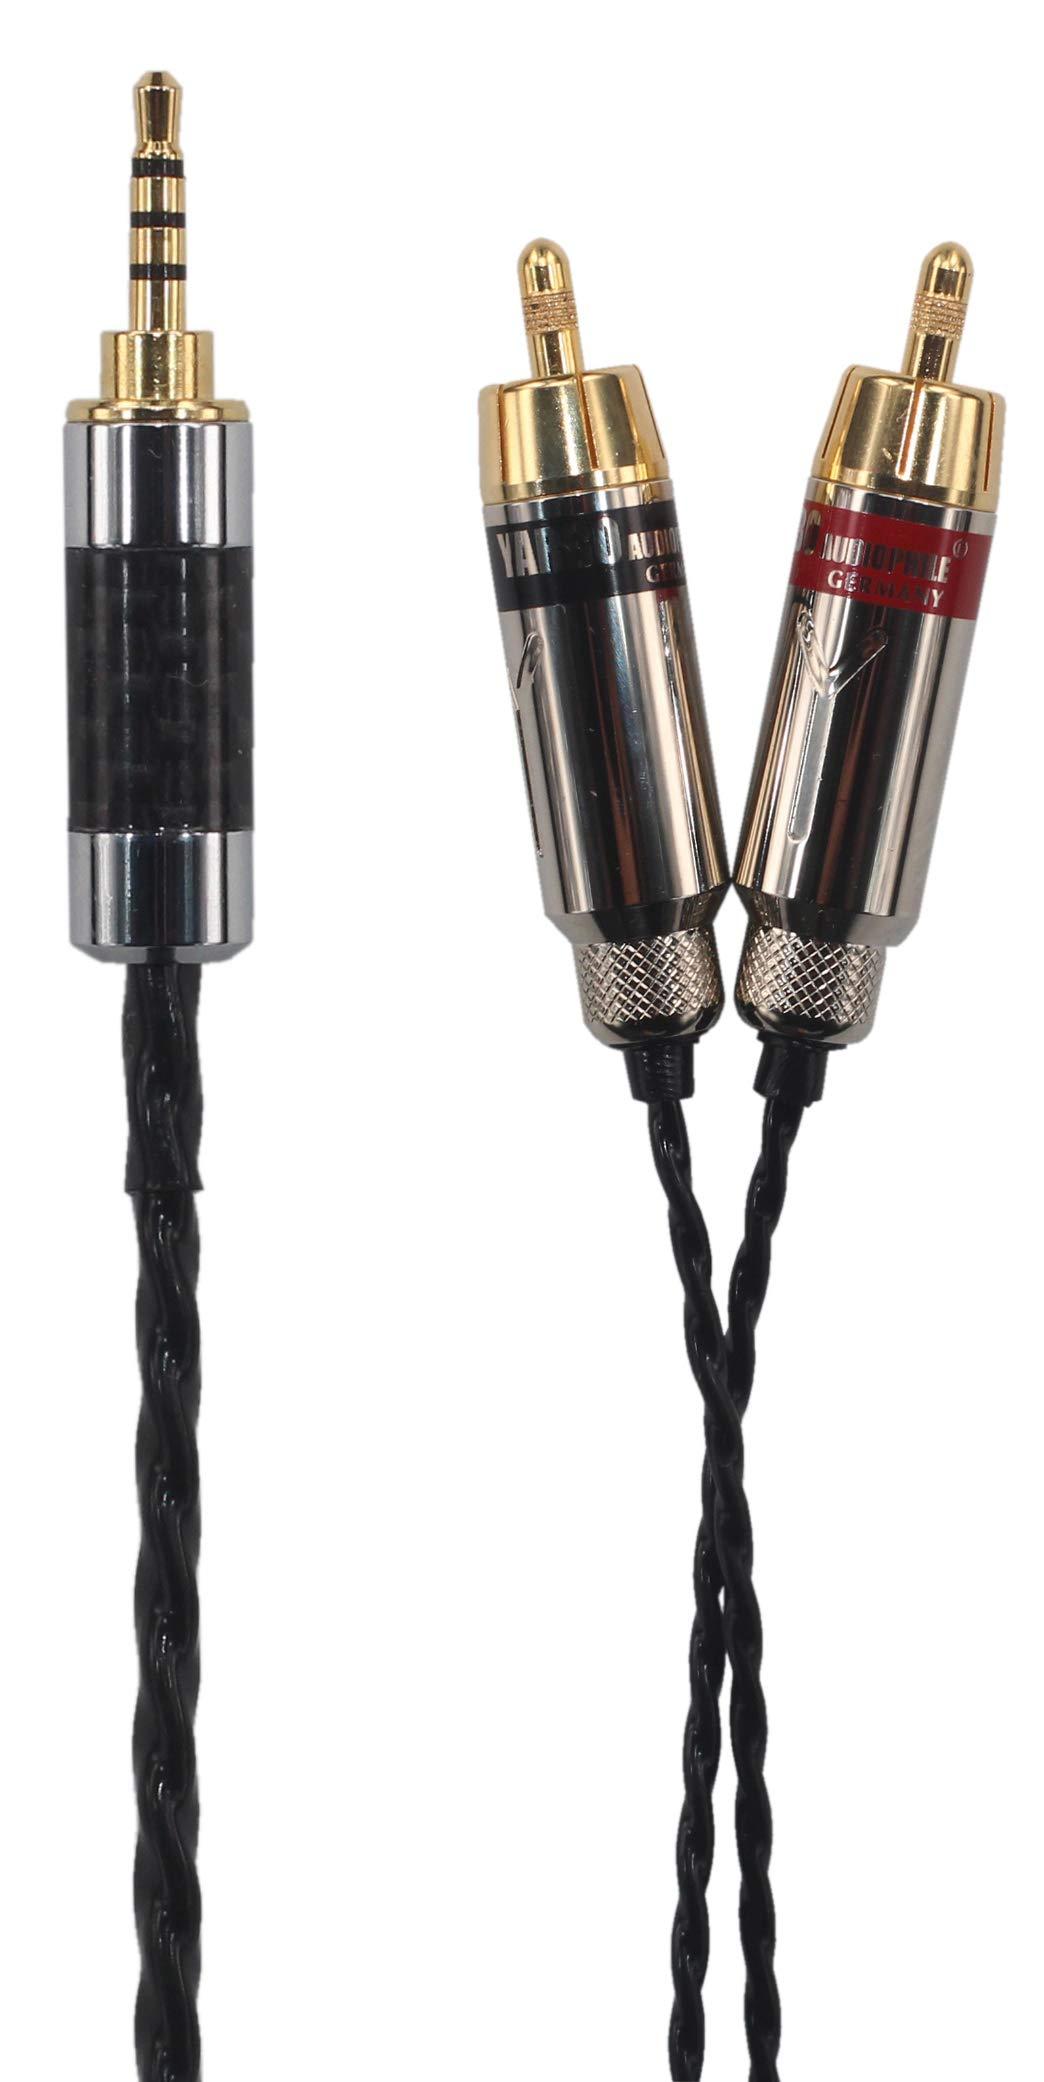 KK Cable RI-SY HiFi 2.5mm TRRS Balanced Male to 2-Male RCA Audio Cable for Ak240, Ak380, Ak320, DP-X1A, iBasso DX200, KANN etc. RI-SY (4.9ft (1.5M))